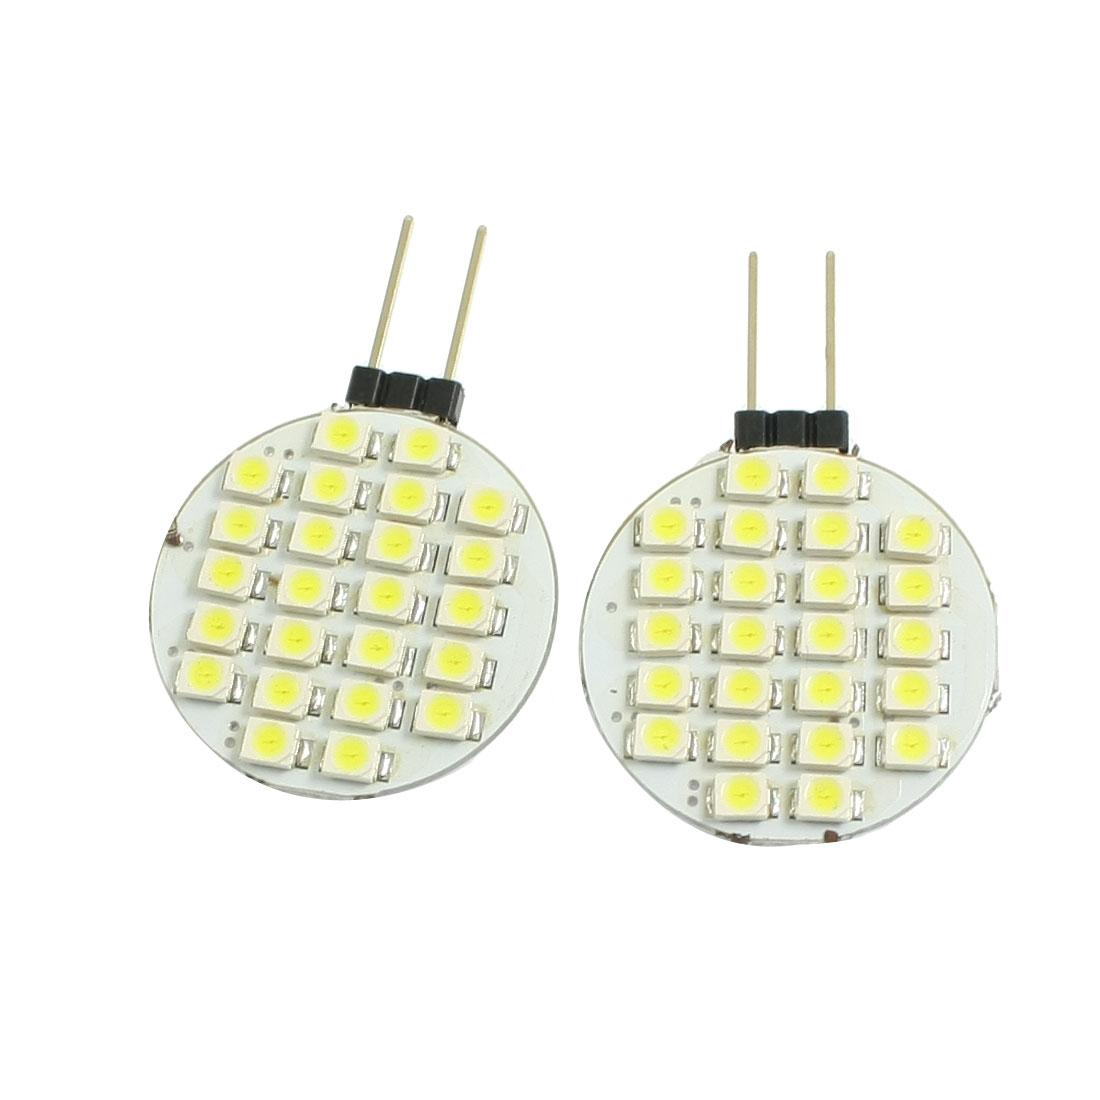 2 Pcs Side Pin G4 White 1210 3528 SMD 24 LED Bulb Light Lamp